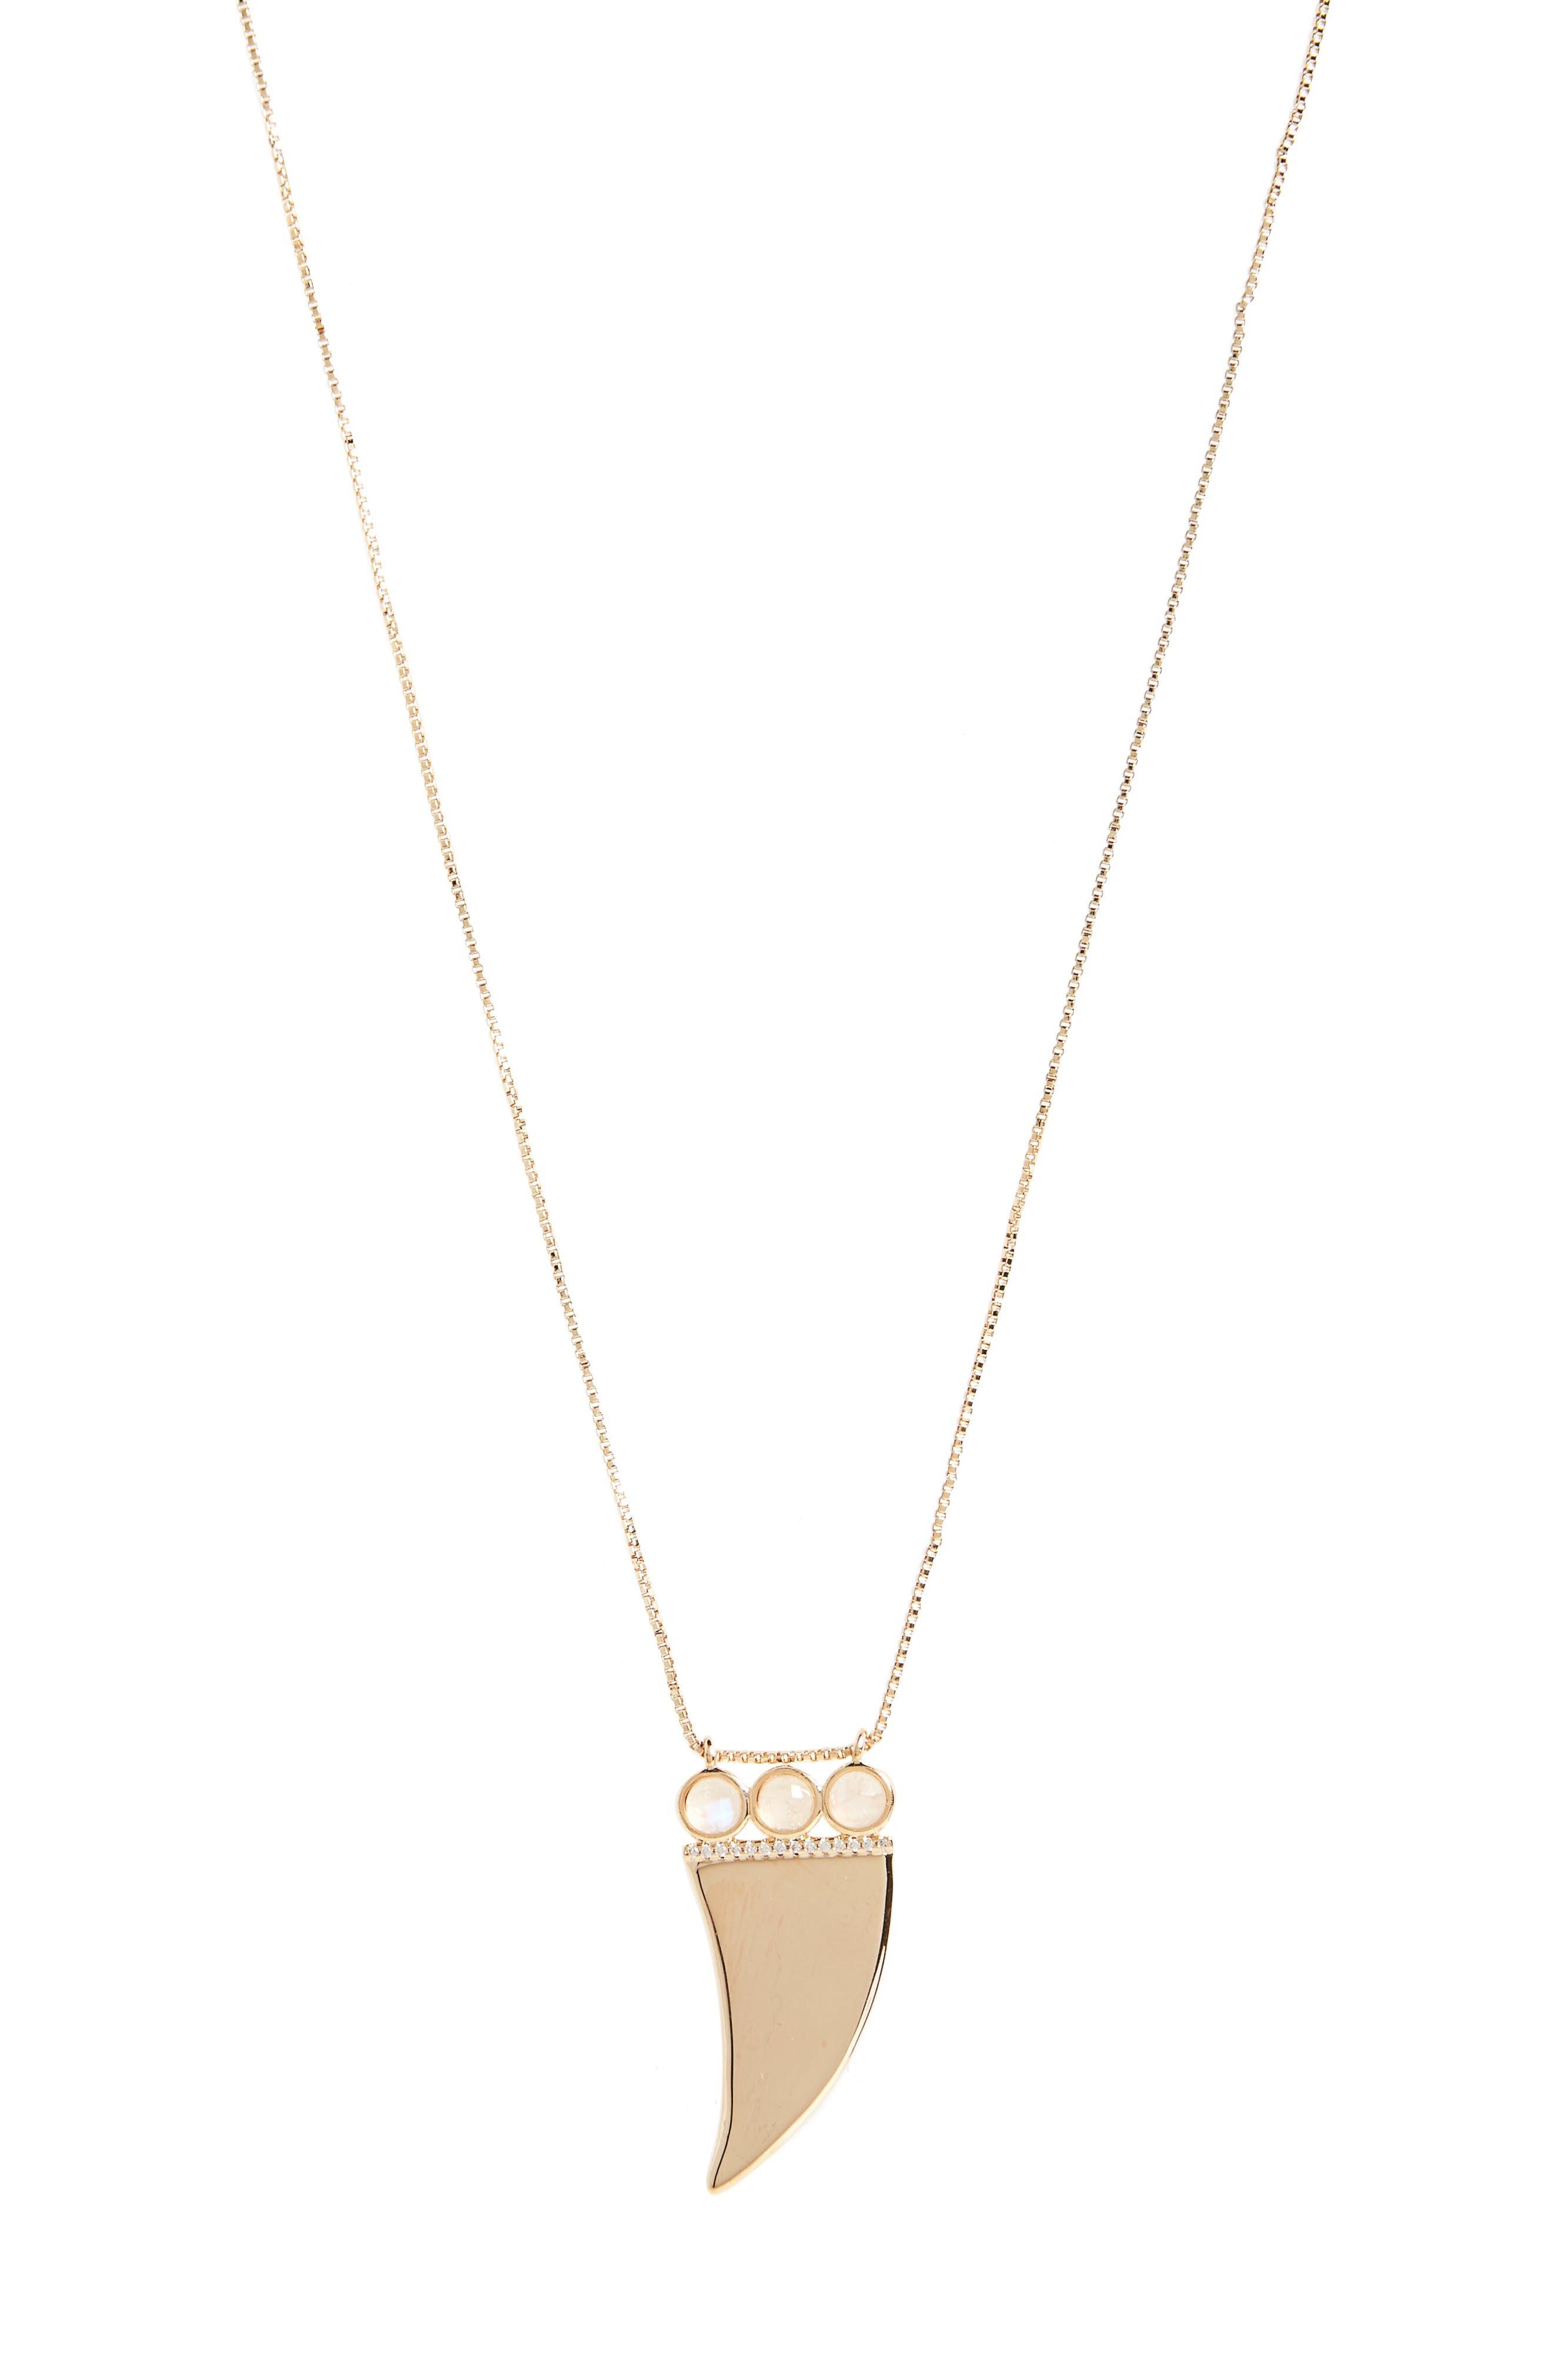 Main Image - Melanie Auld Hendrix Horn Pendant Necklace